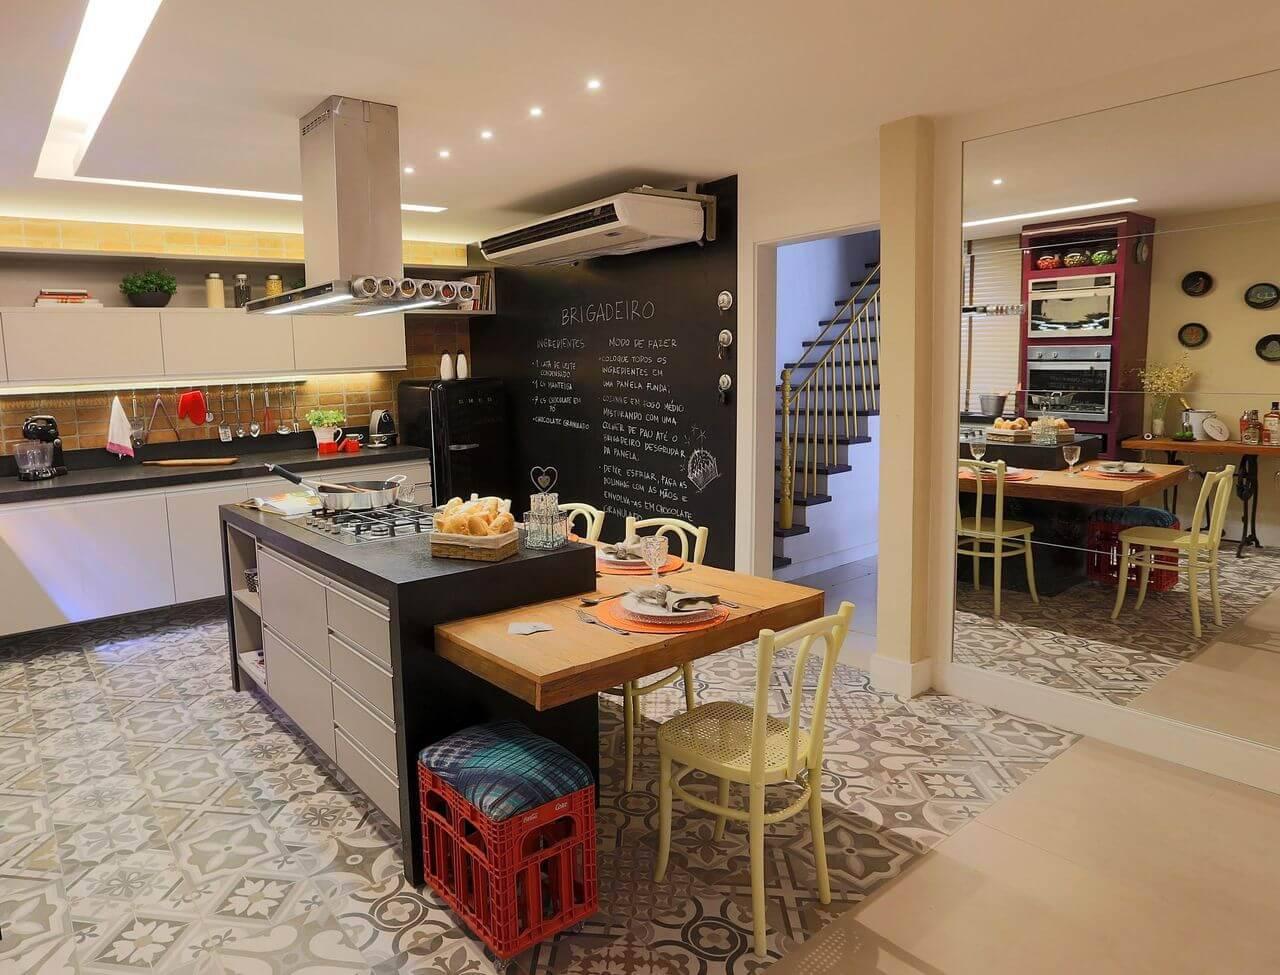 pisos para cozinha lorrayne zucolotto-49603